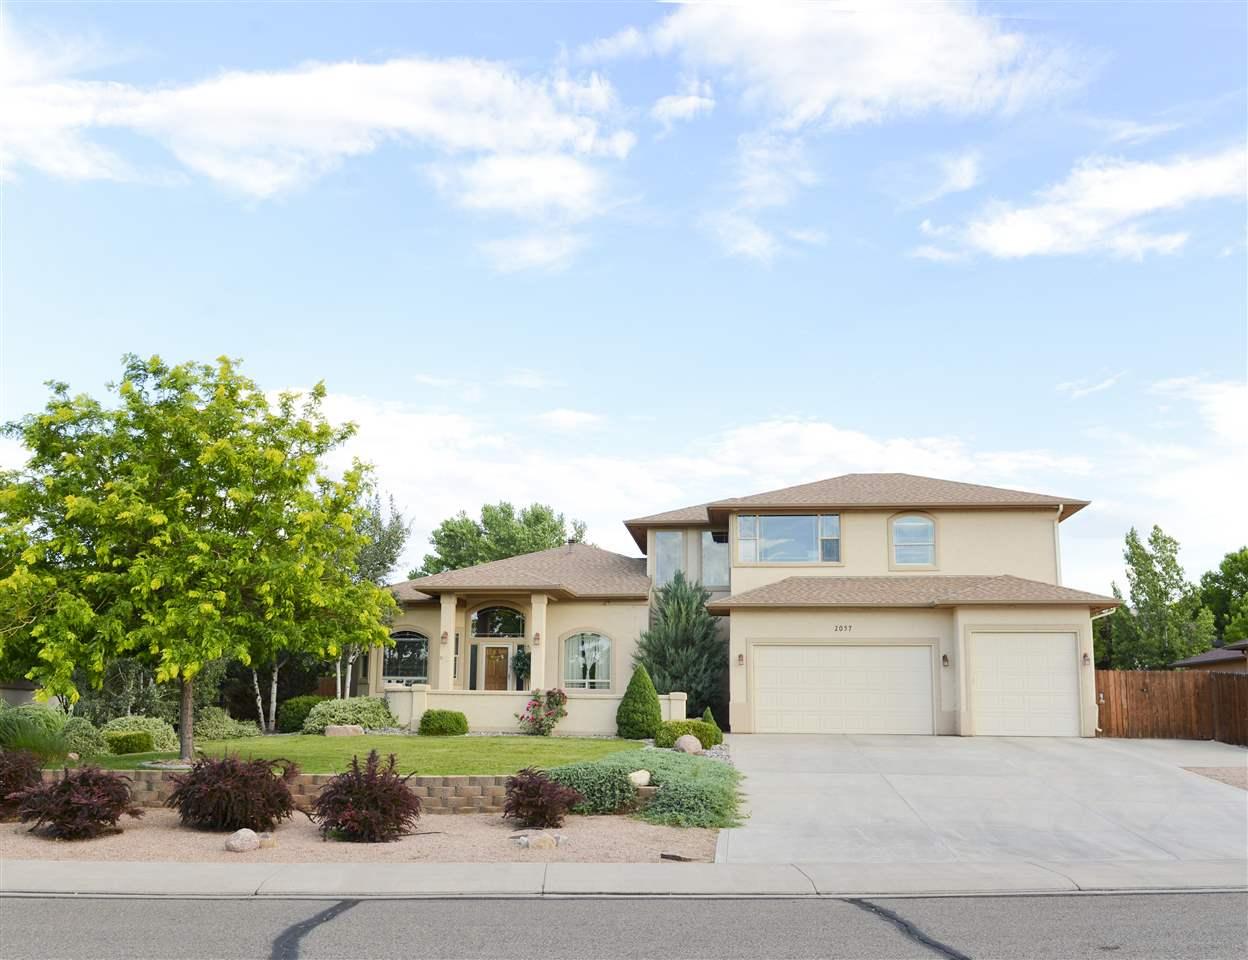 2057 Baseline Drive, Grand Junction, CO 81507